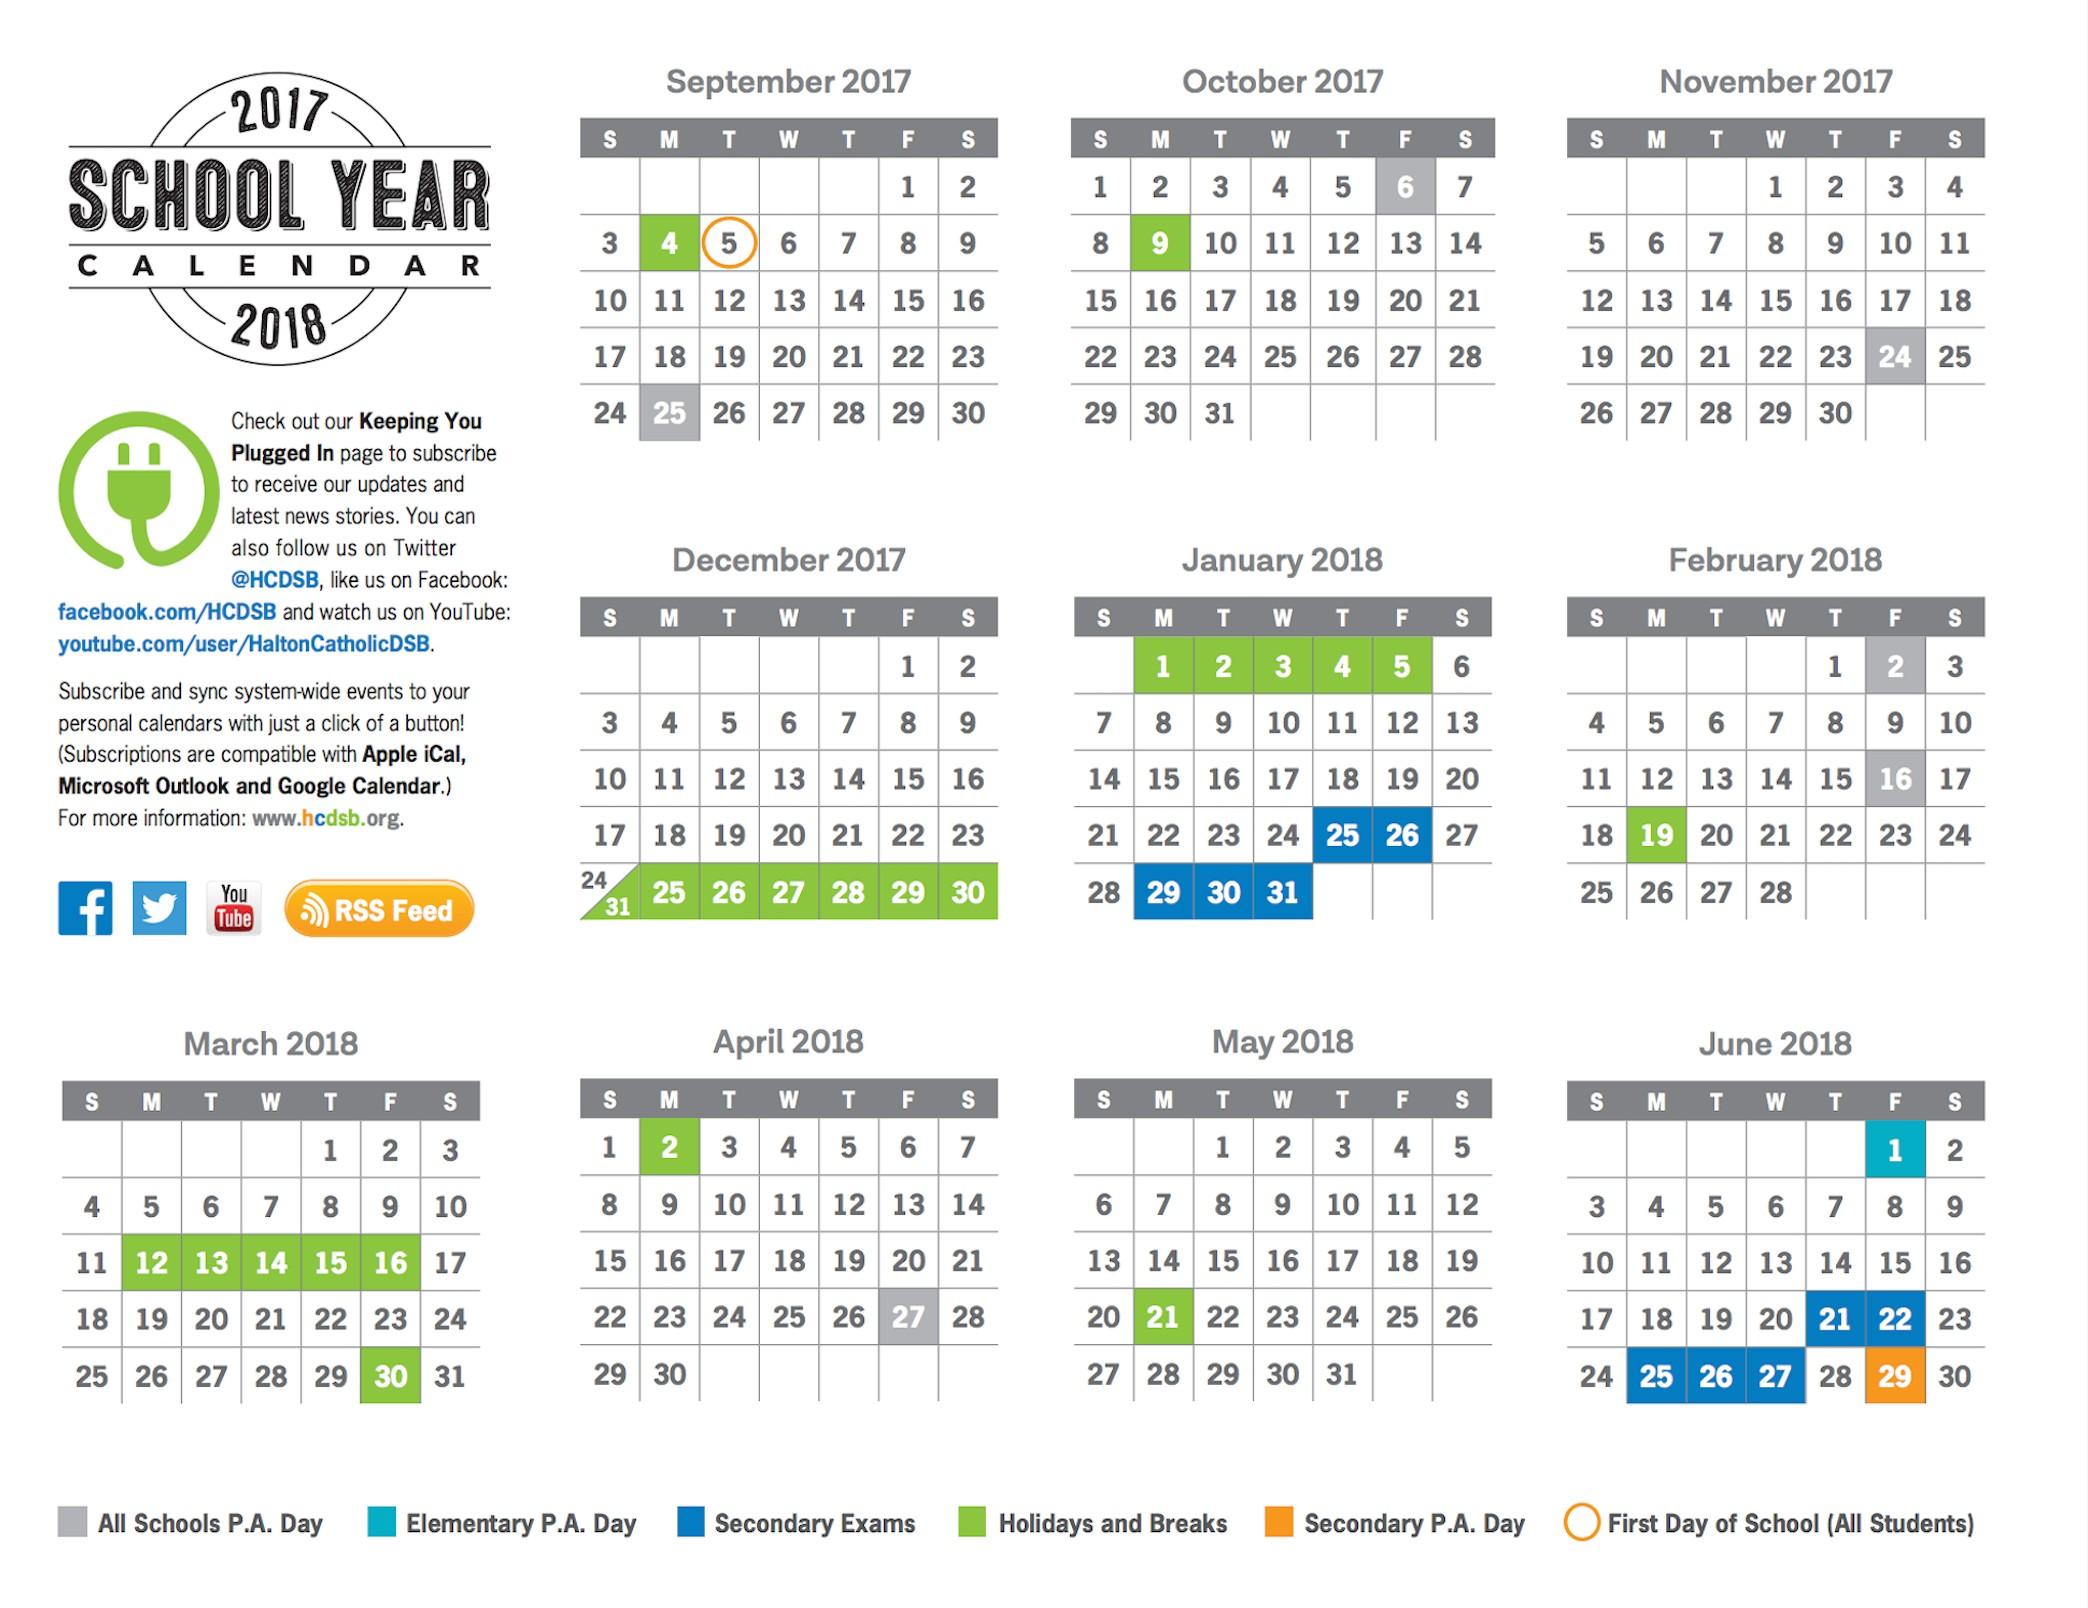 March Calendar Print Out Más Arriba-a-fecha 2017 2018 School Year Calendar Of March Calendar Print Out Recientes Monthly Calendar 2015 Template Printable 2016 Calendar Templates